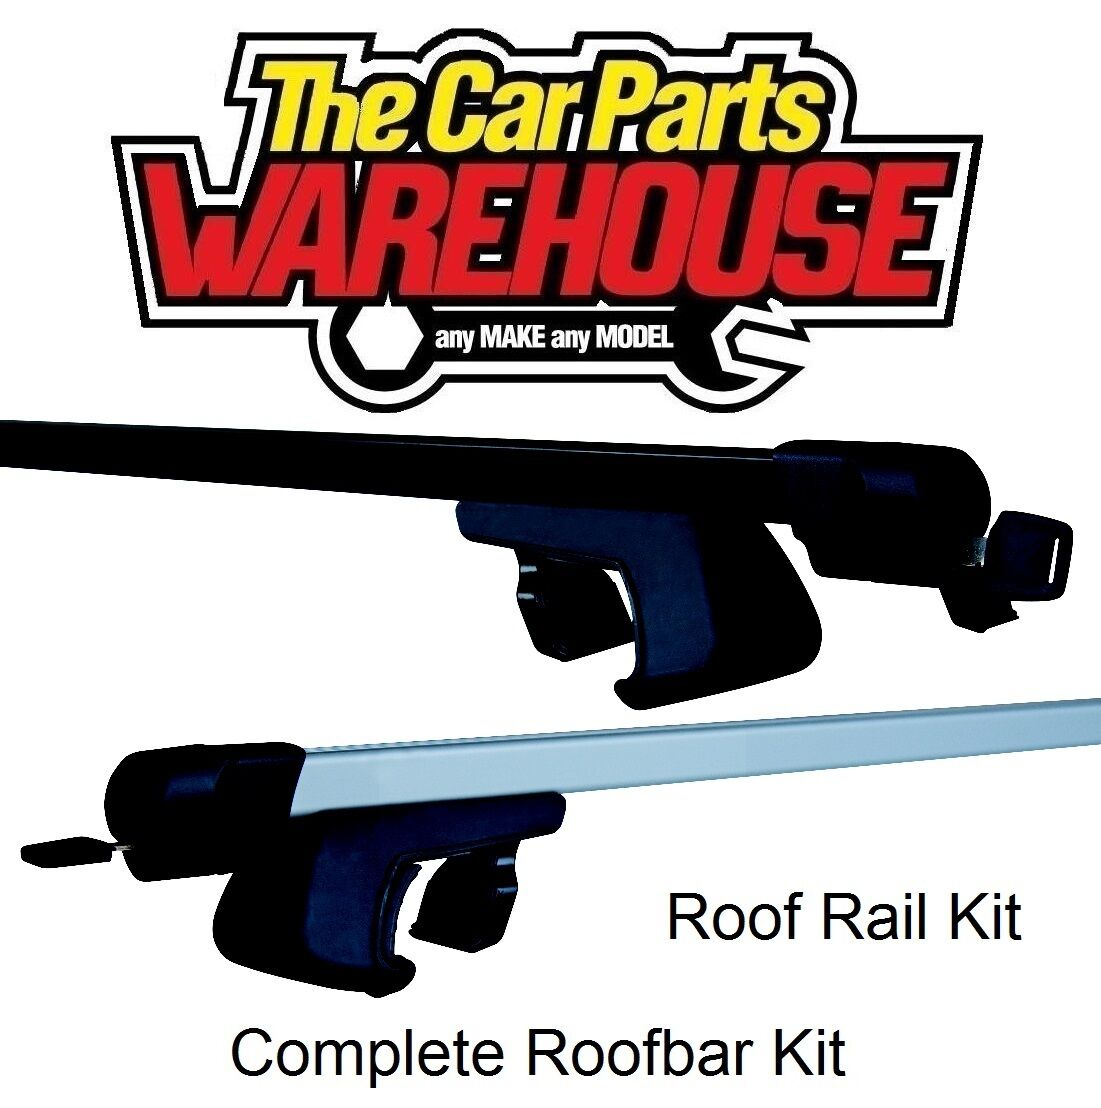 full roof rack bar kit sum520 mountney with rails. Black Bedroom Furniture Sets. Home Design Ideas